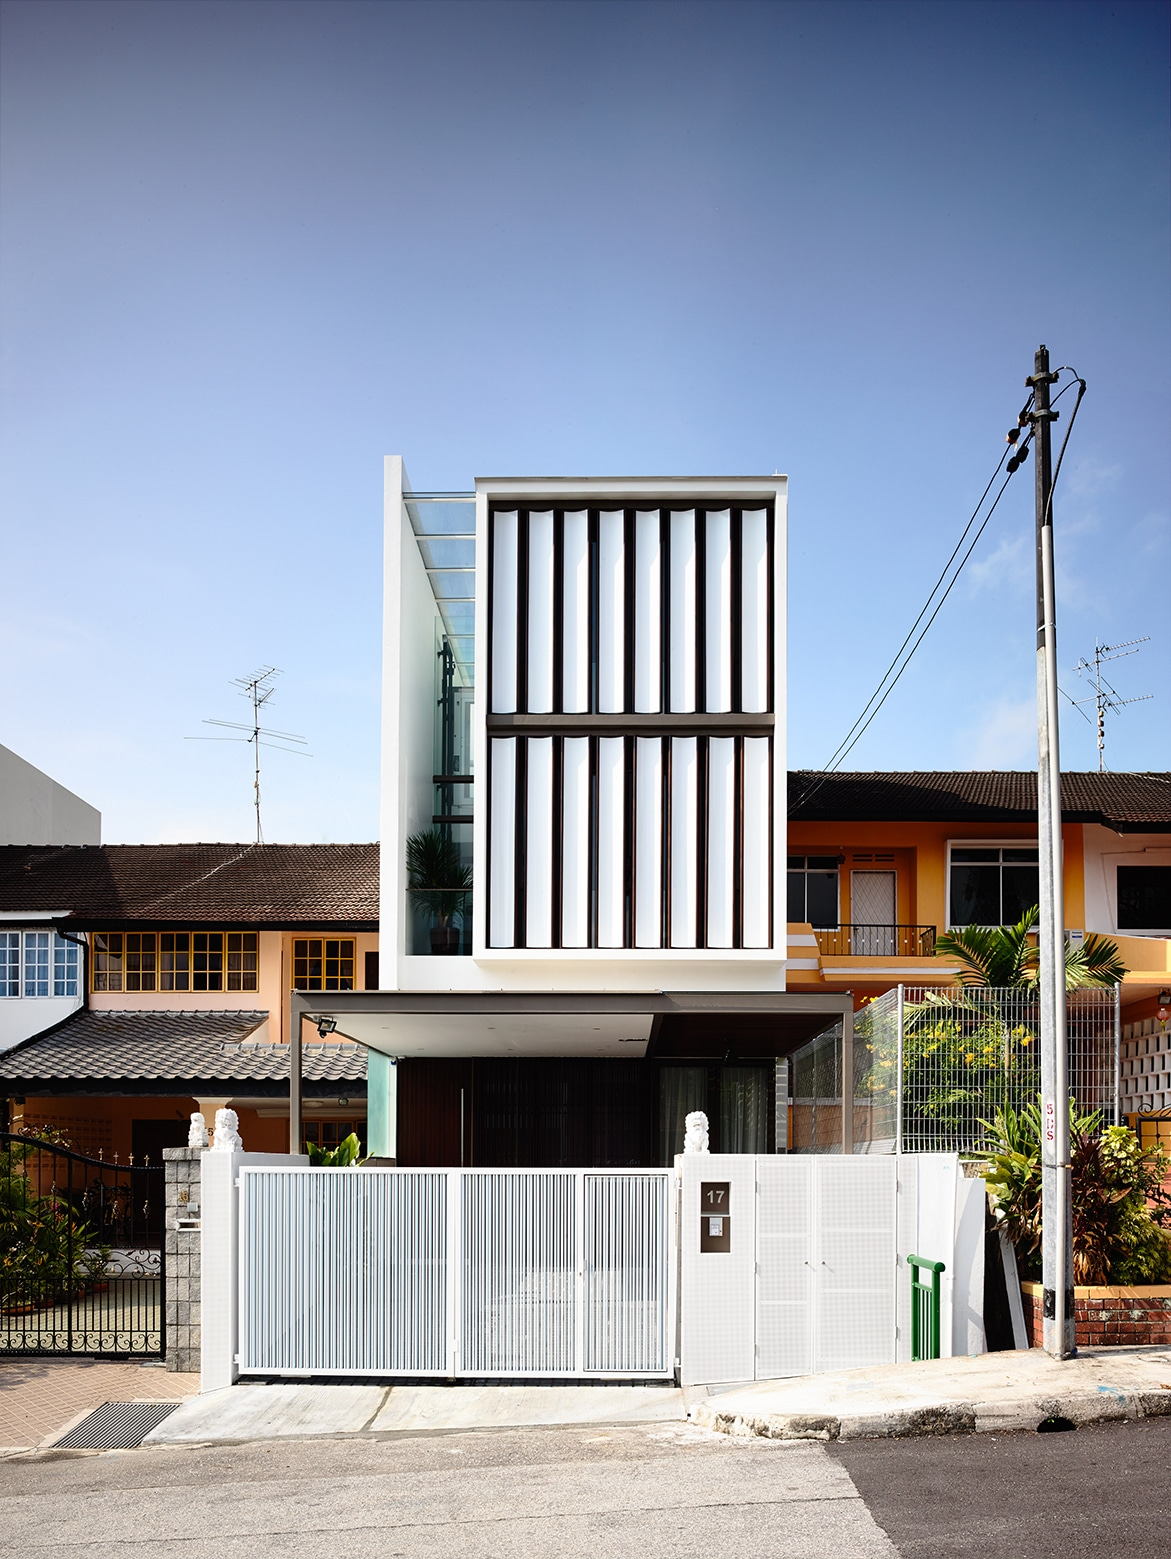 Fachadas modernas de casas de dos pisos construye hogar - Casas estrechas y largas ...